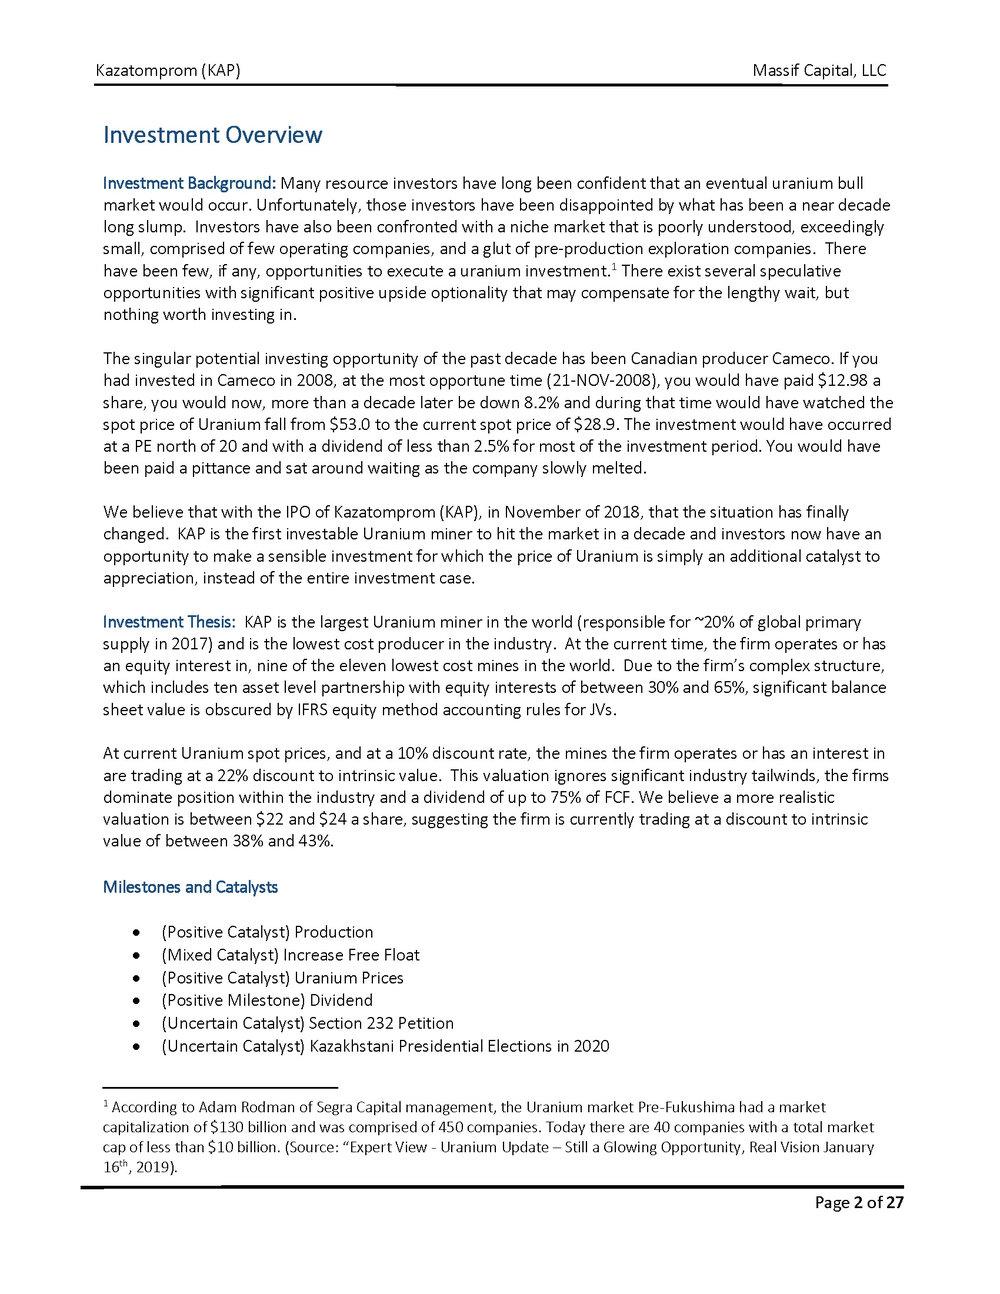 Initiating Report - KAP - January 2019 - Massif Capital_Page_03.jpg